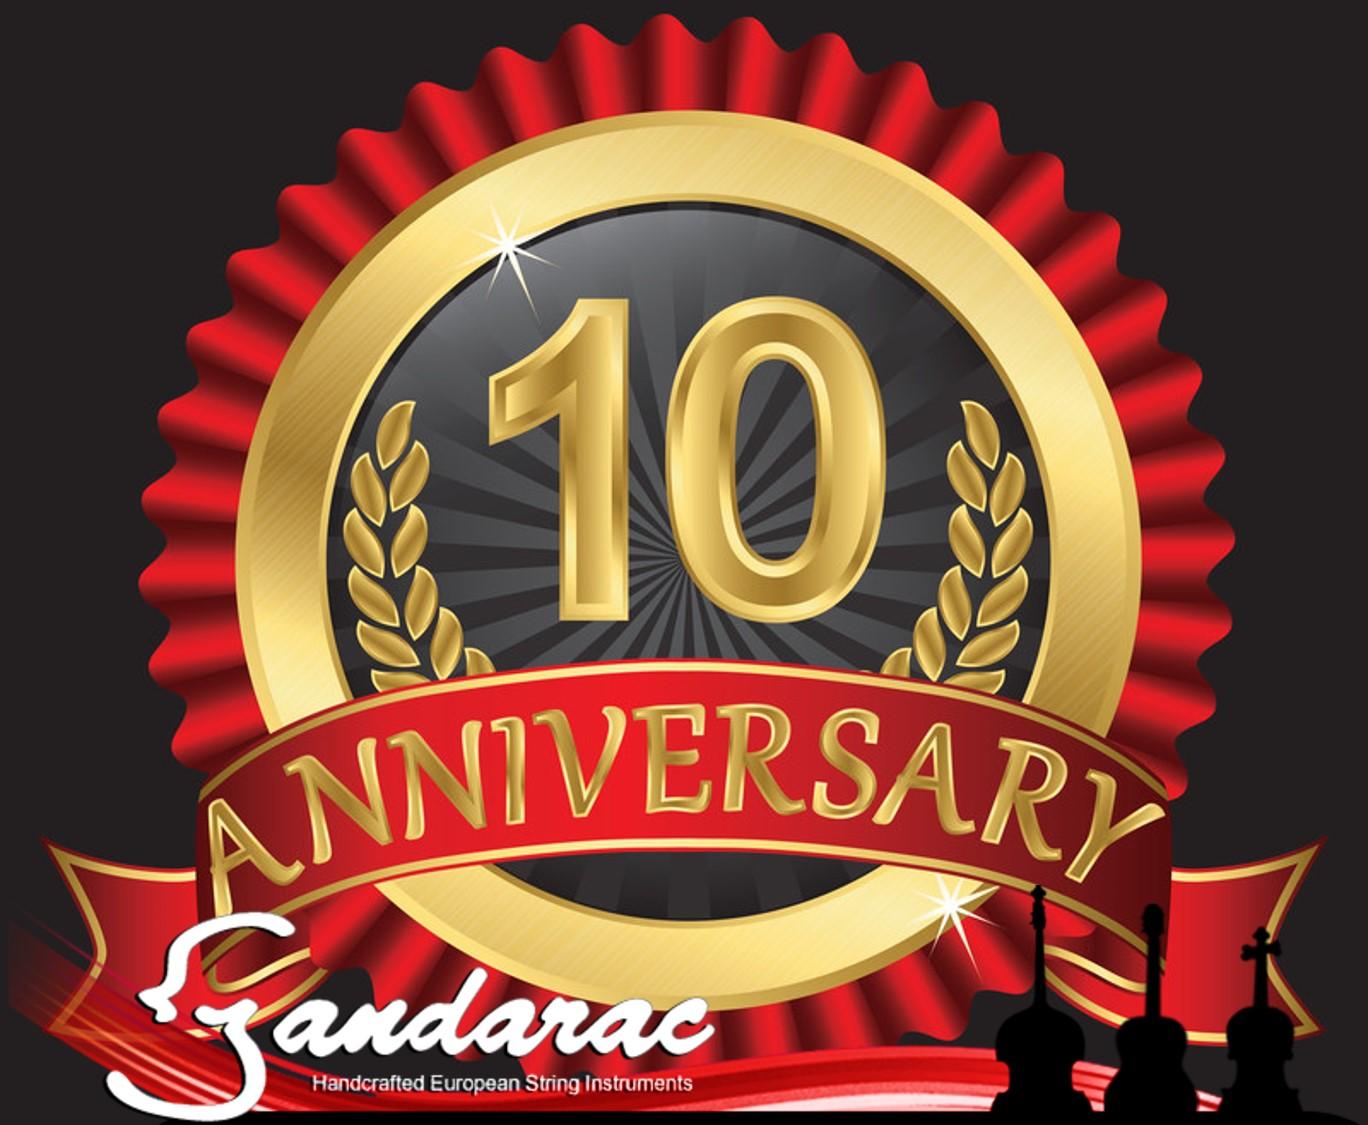 03-10th-anniversary